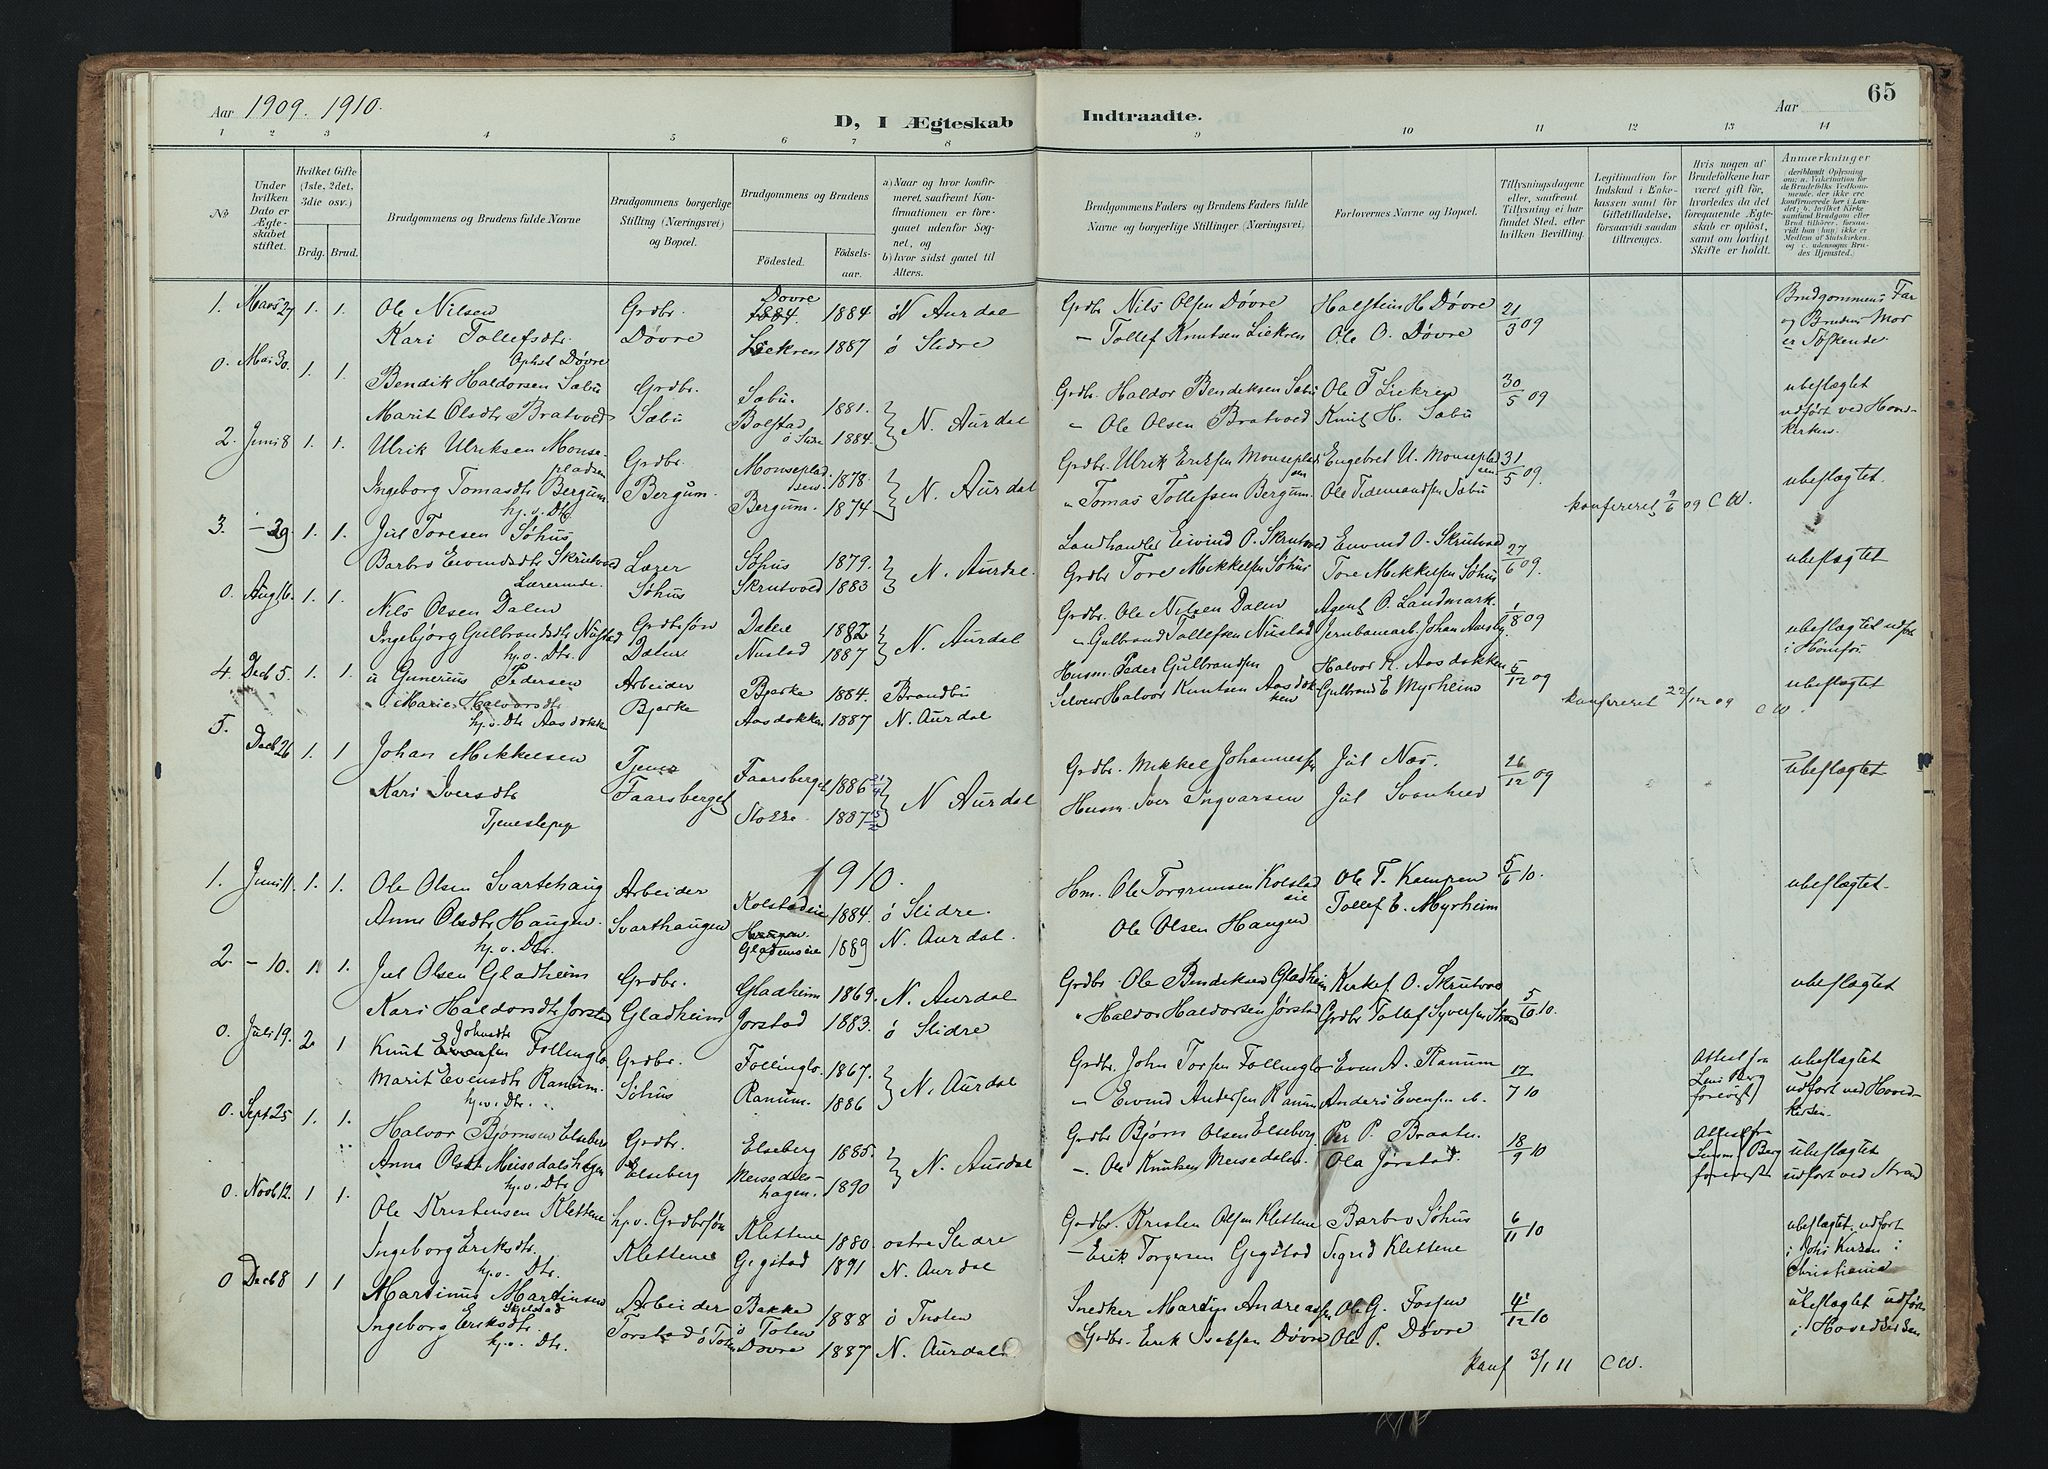 SAH, Nord-Aurdal prestekontor, Ministerialbok nr. 15, 1896-1914, s. 65